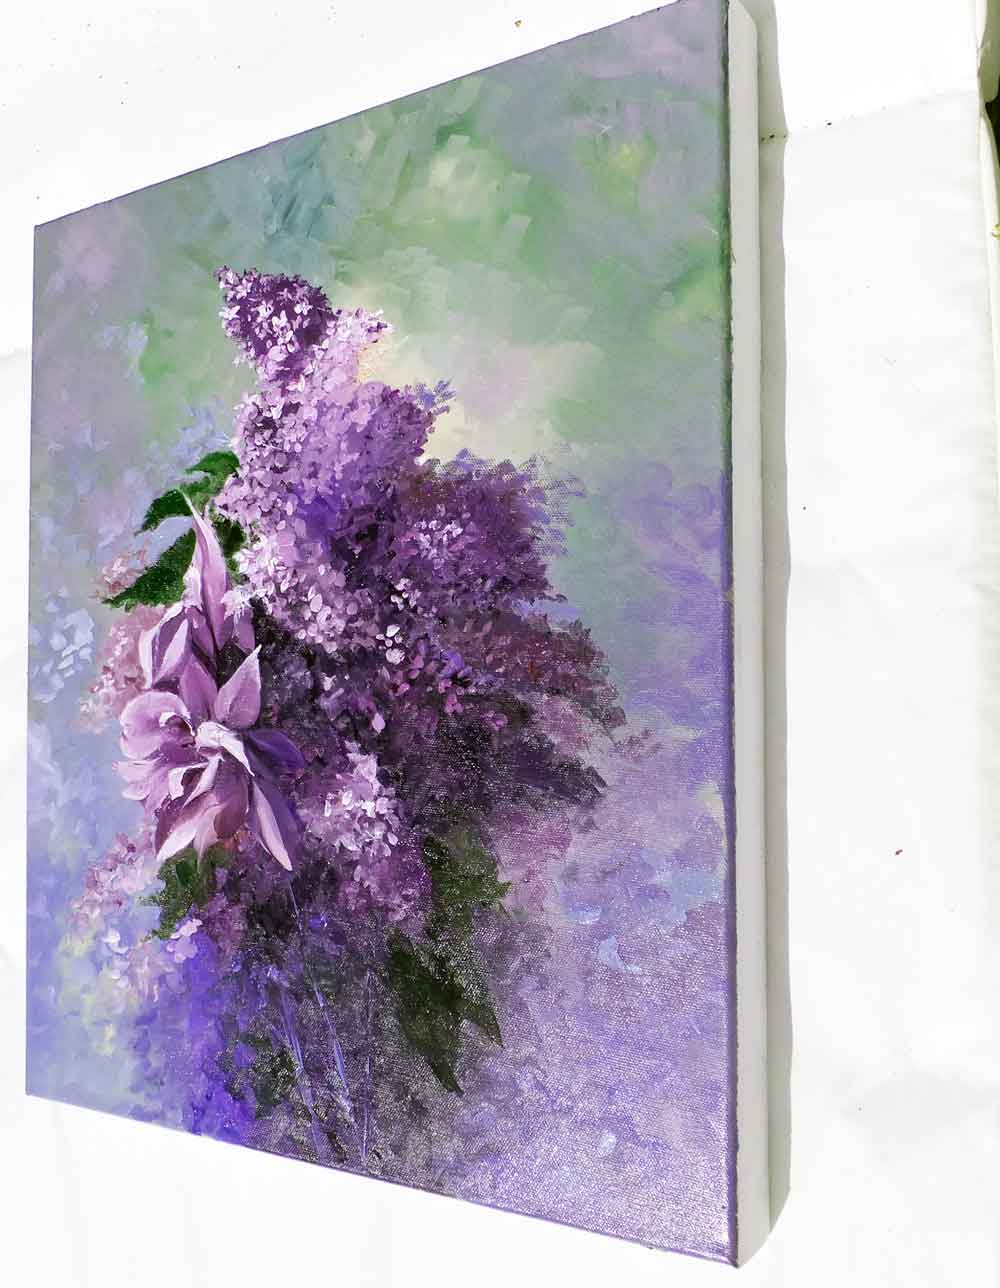 Iris and Lilacs (in situ)